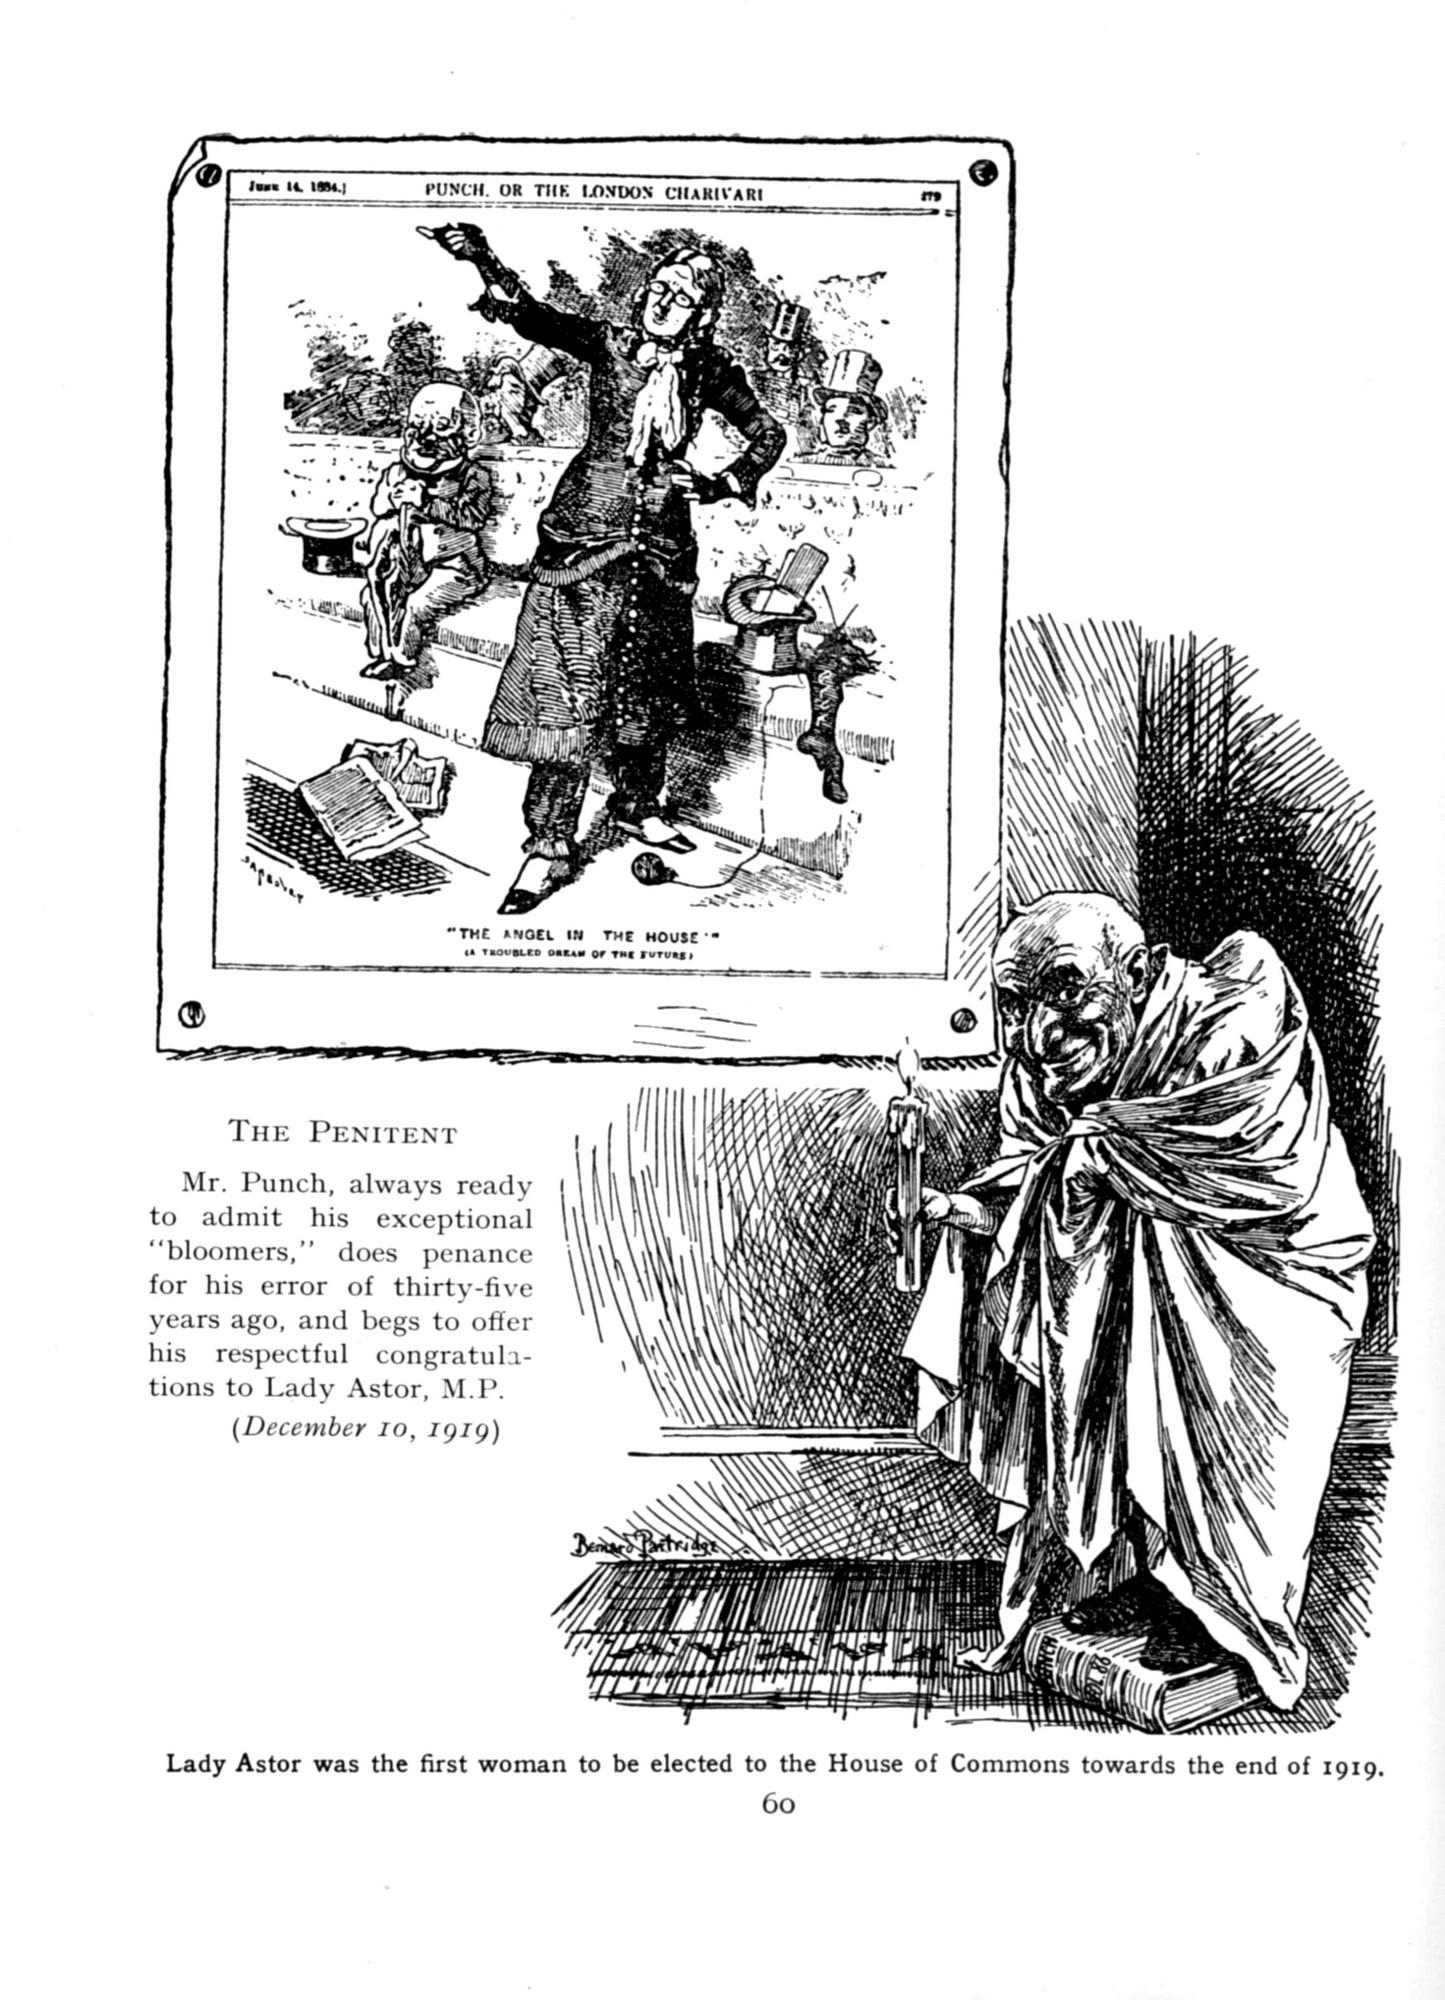 1919 Punch Cavalcade p60 - The Penitent